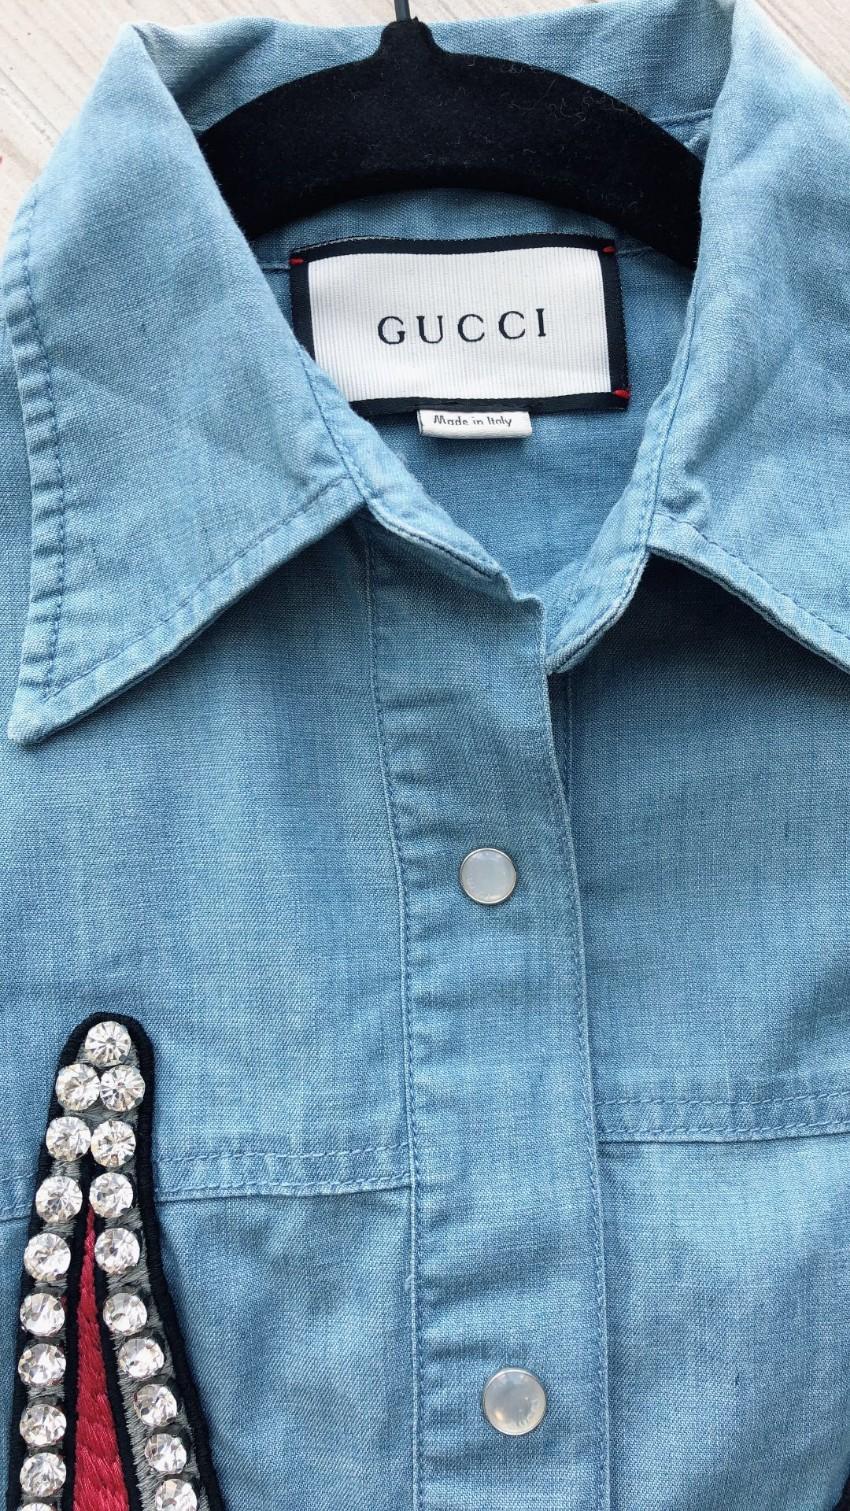 31cfa064f Gucci Bugs Bunny Embellished Denim Shirt | HEWI London